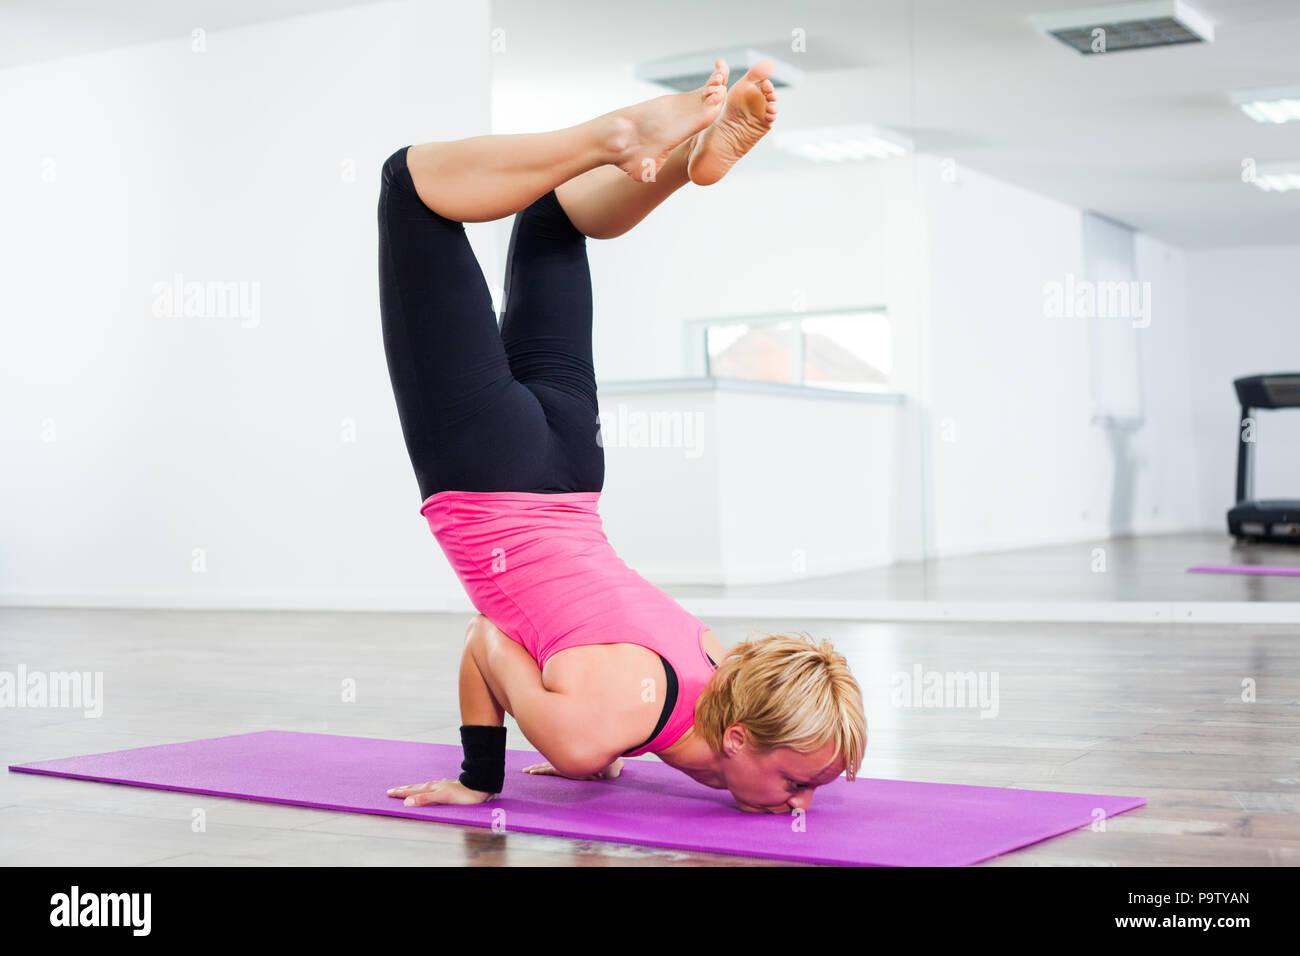 1aed87c9ebfe4 Young woman practicing yoga, Vrschikasana / Scorpion pose Stock ...